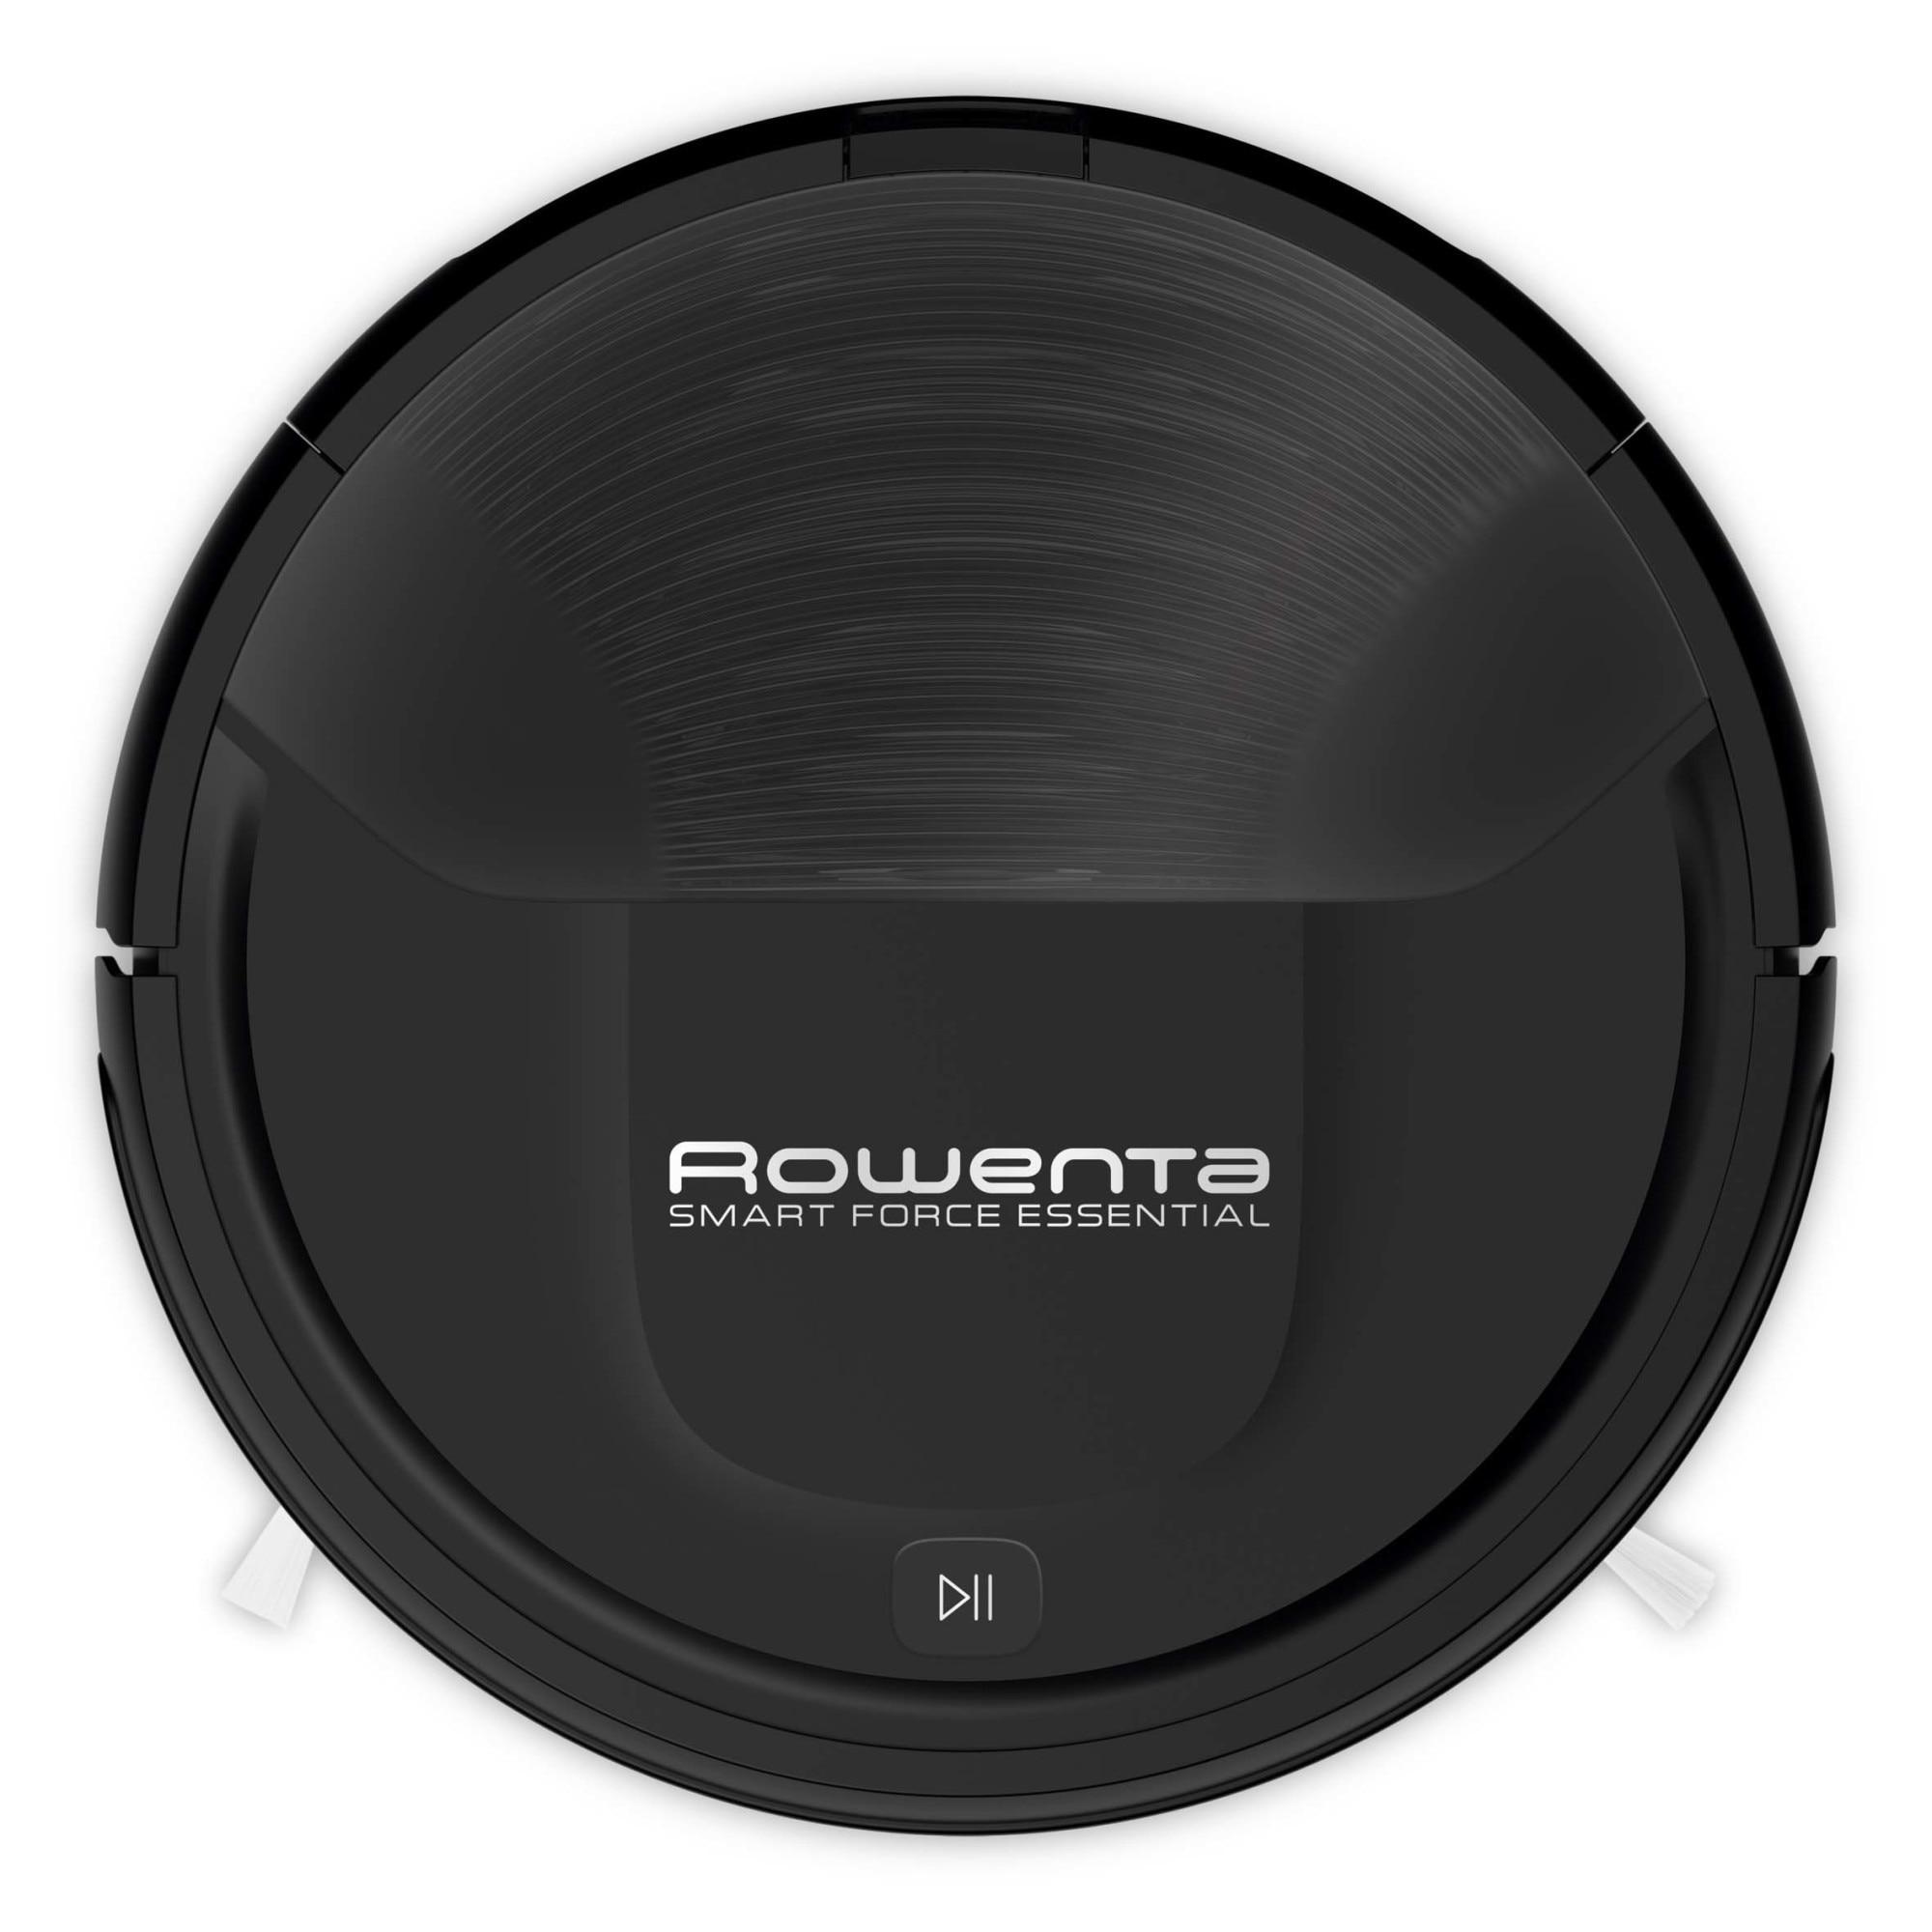 Fotografie Aspirator robot Rowenta Smart Force Essential RR6925WH, 3 functii, Autonomie pana la 150min, Functia Magnetic Strip, Senzor infrarosu si denivelari, Negru